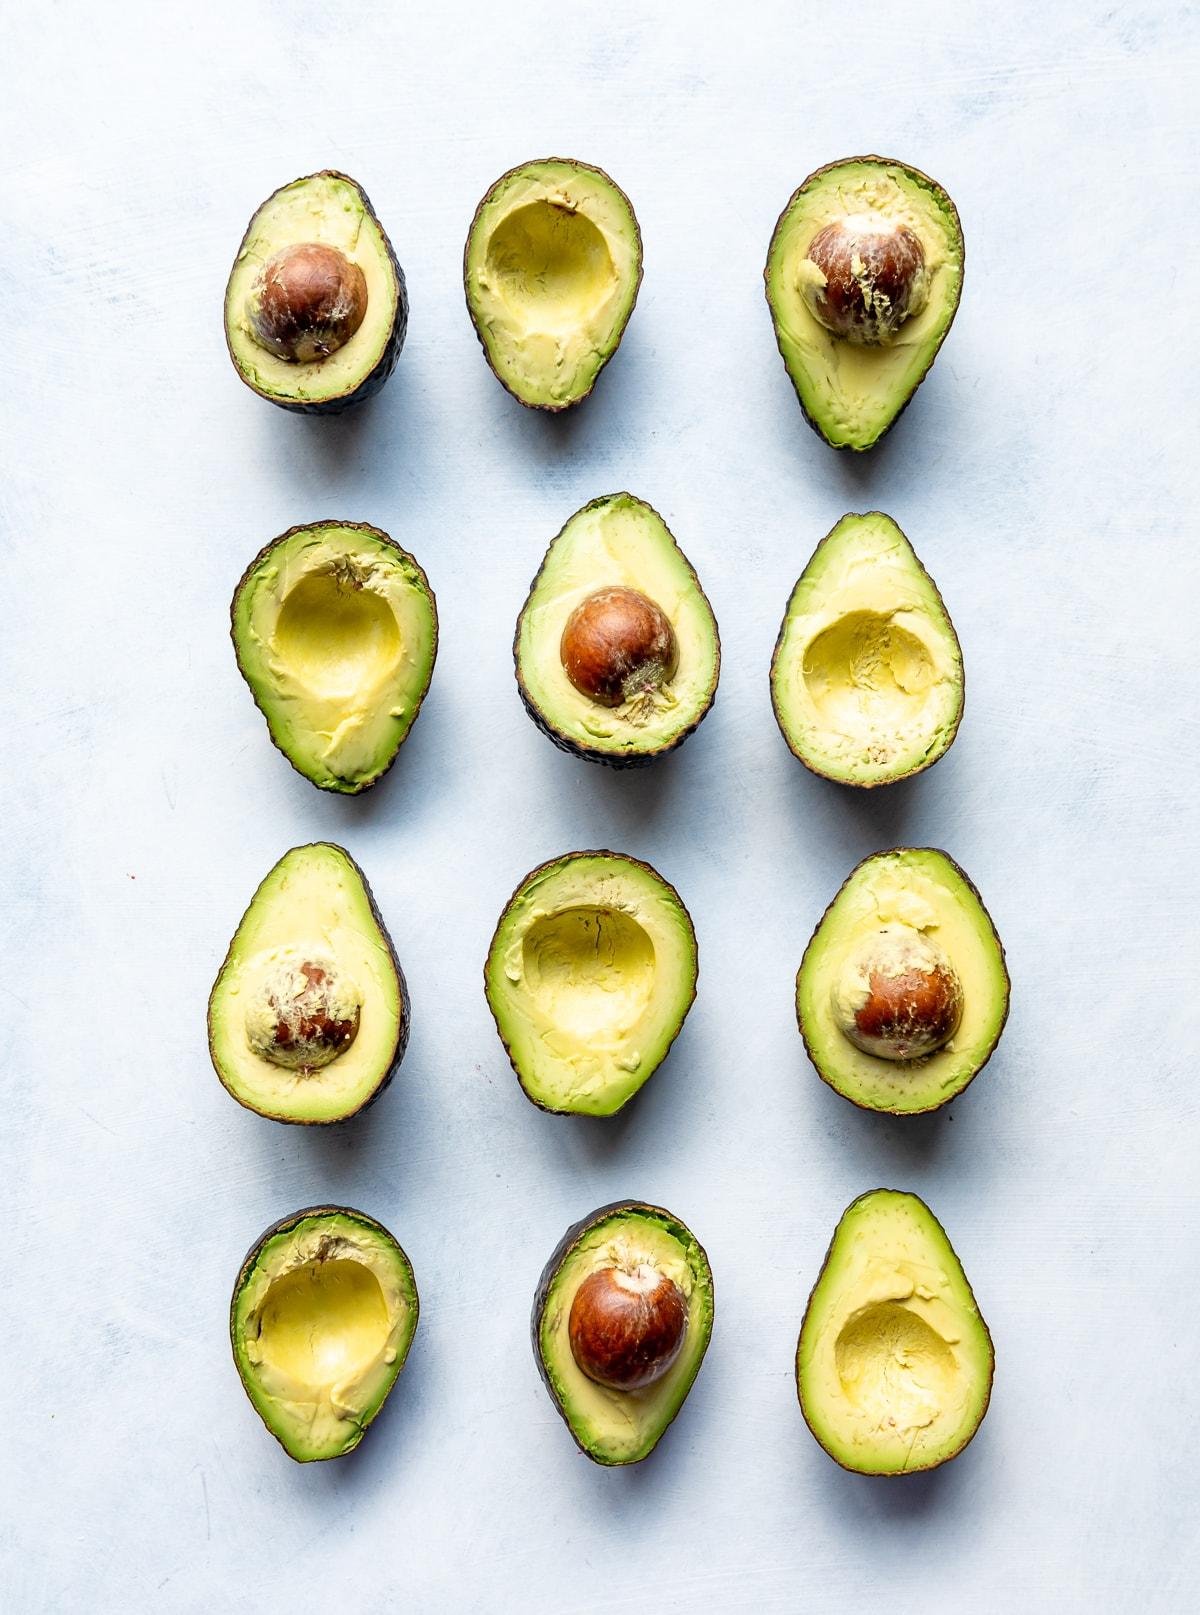 green avocados cut in half